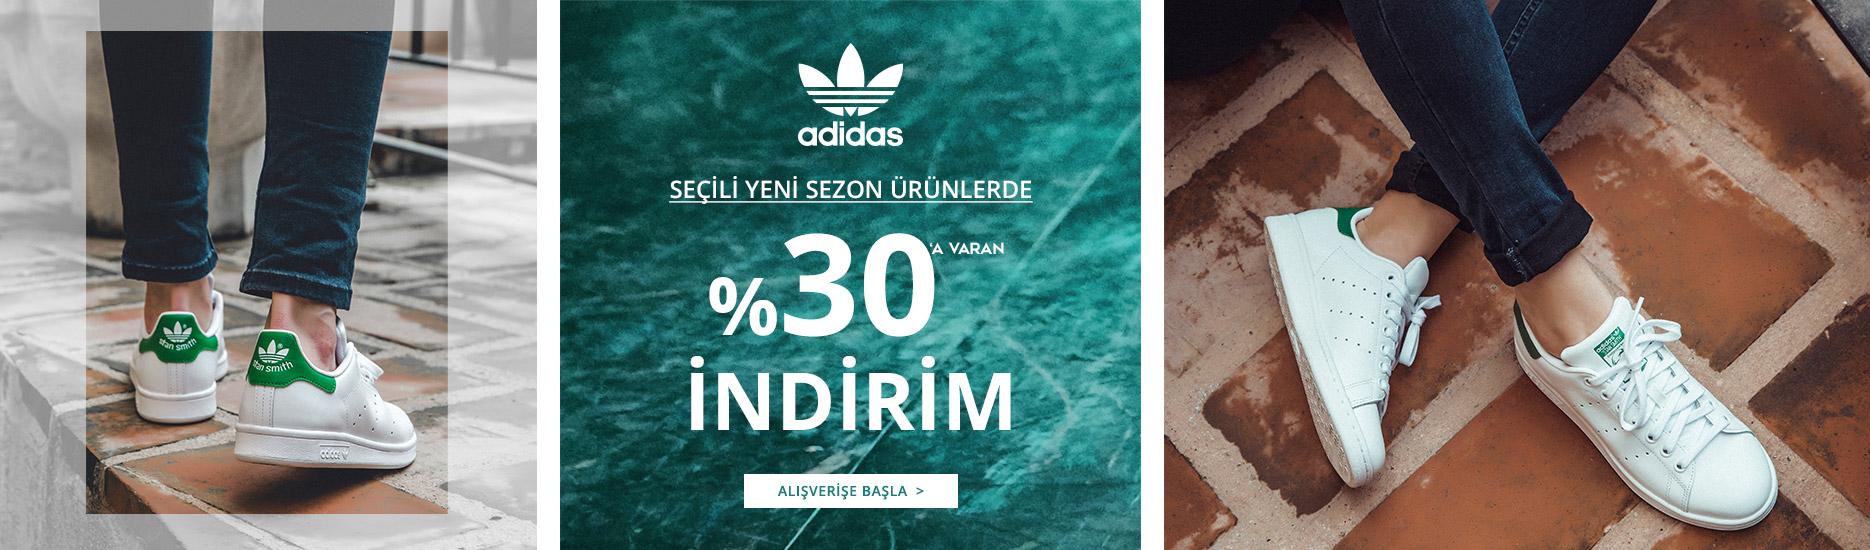 Adidas-30-indirim